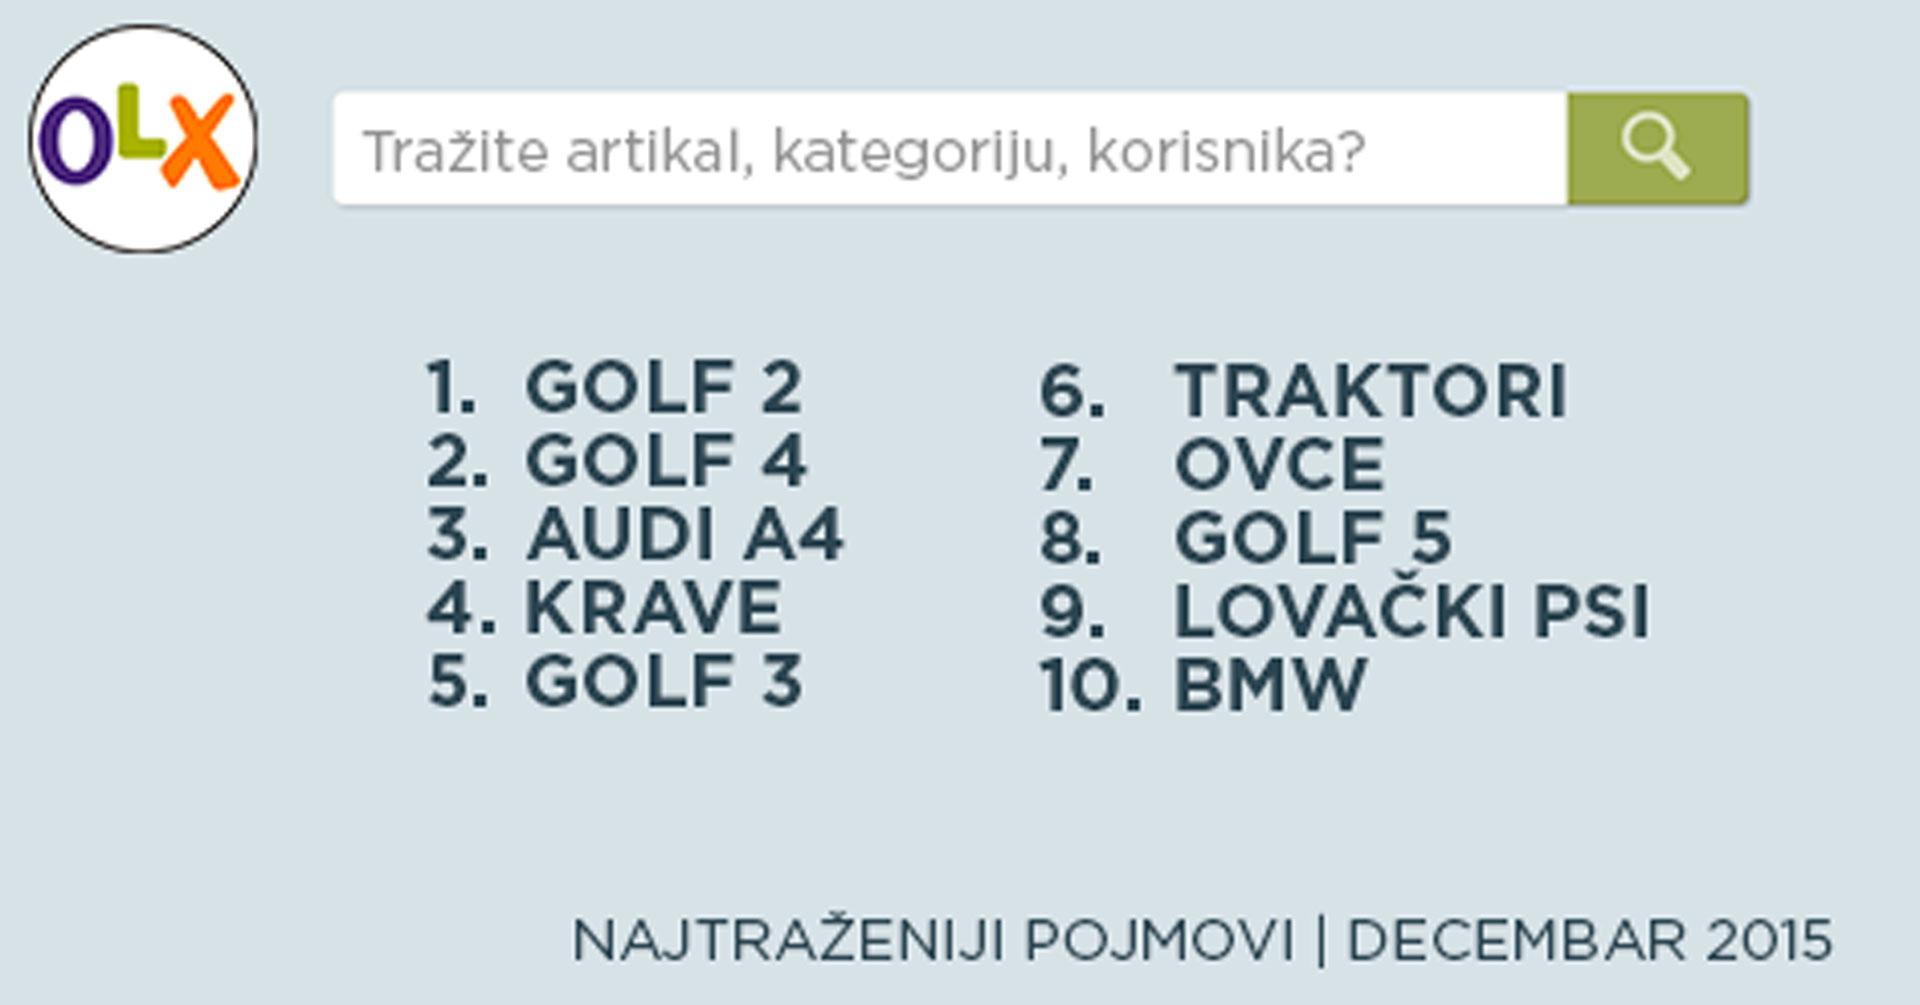 "Najtraženiji pojmovi na Olx.ba: Od golfa ""dvice"" do krave i ovce"